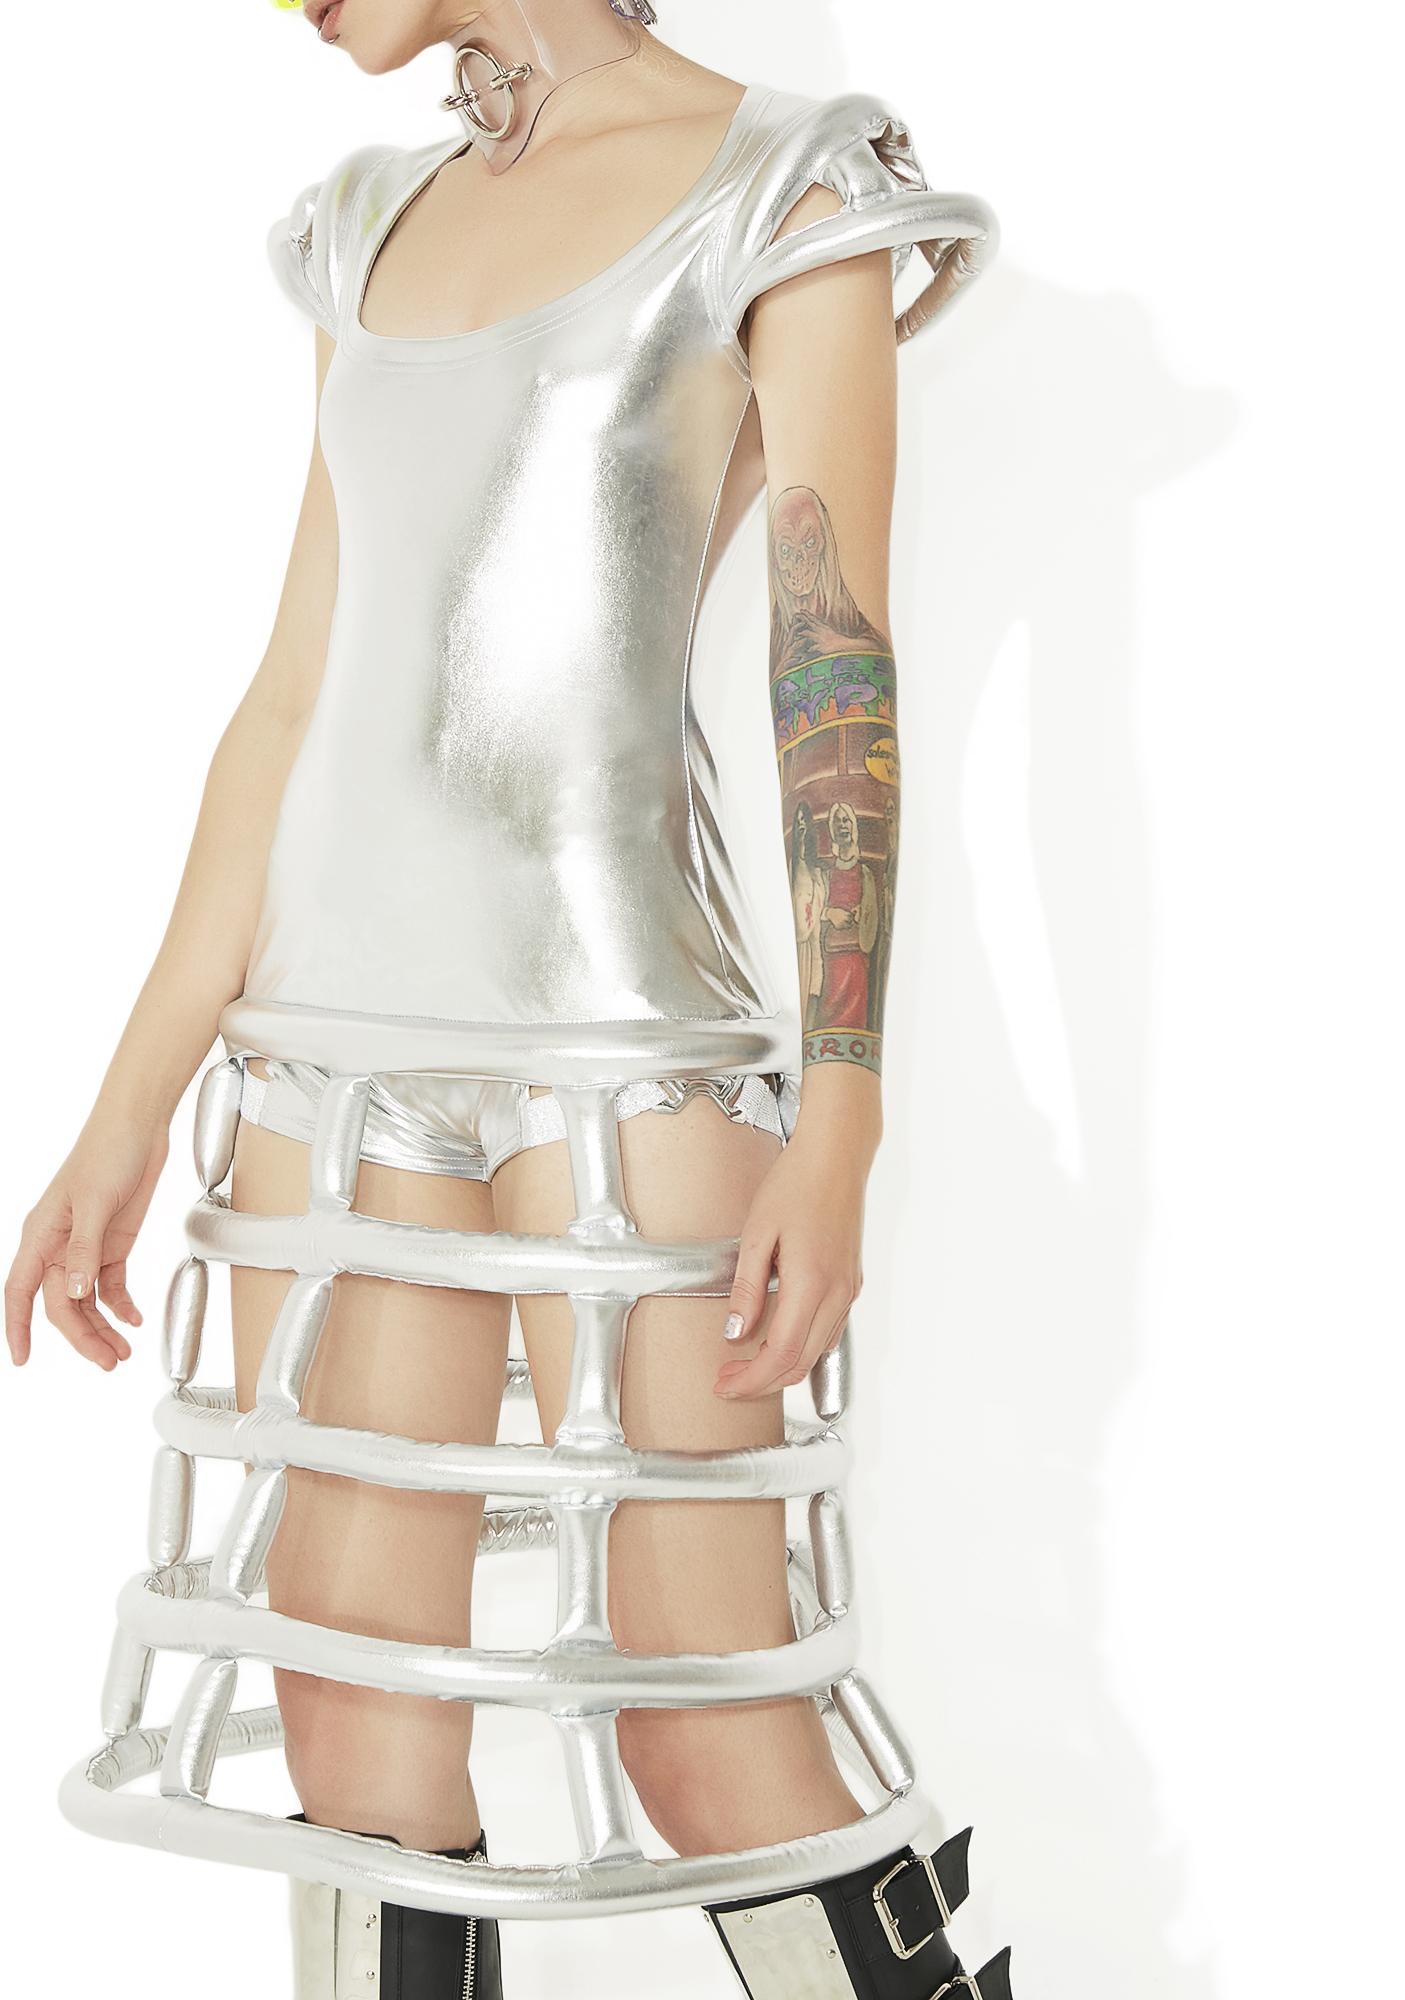 Cyberdog Cyber Crinolina Dress